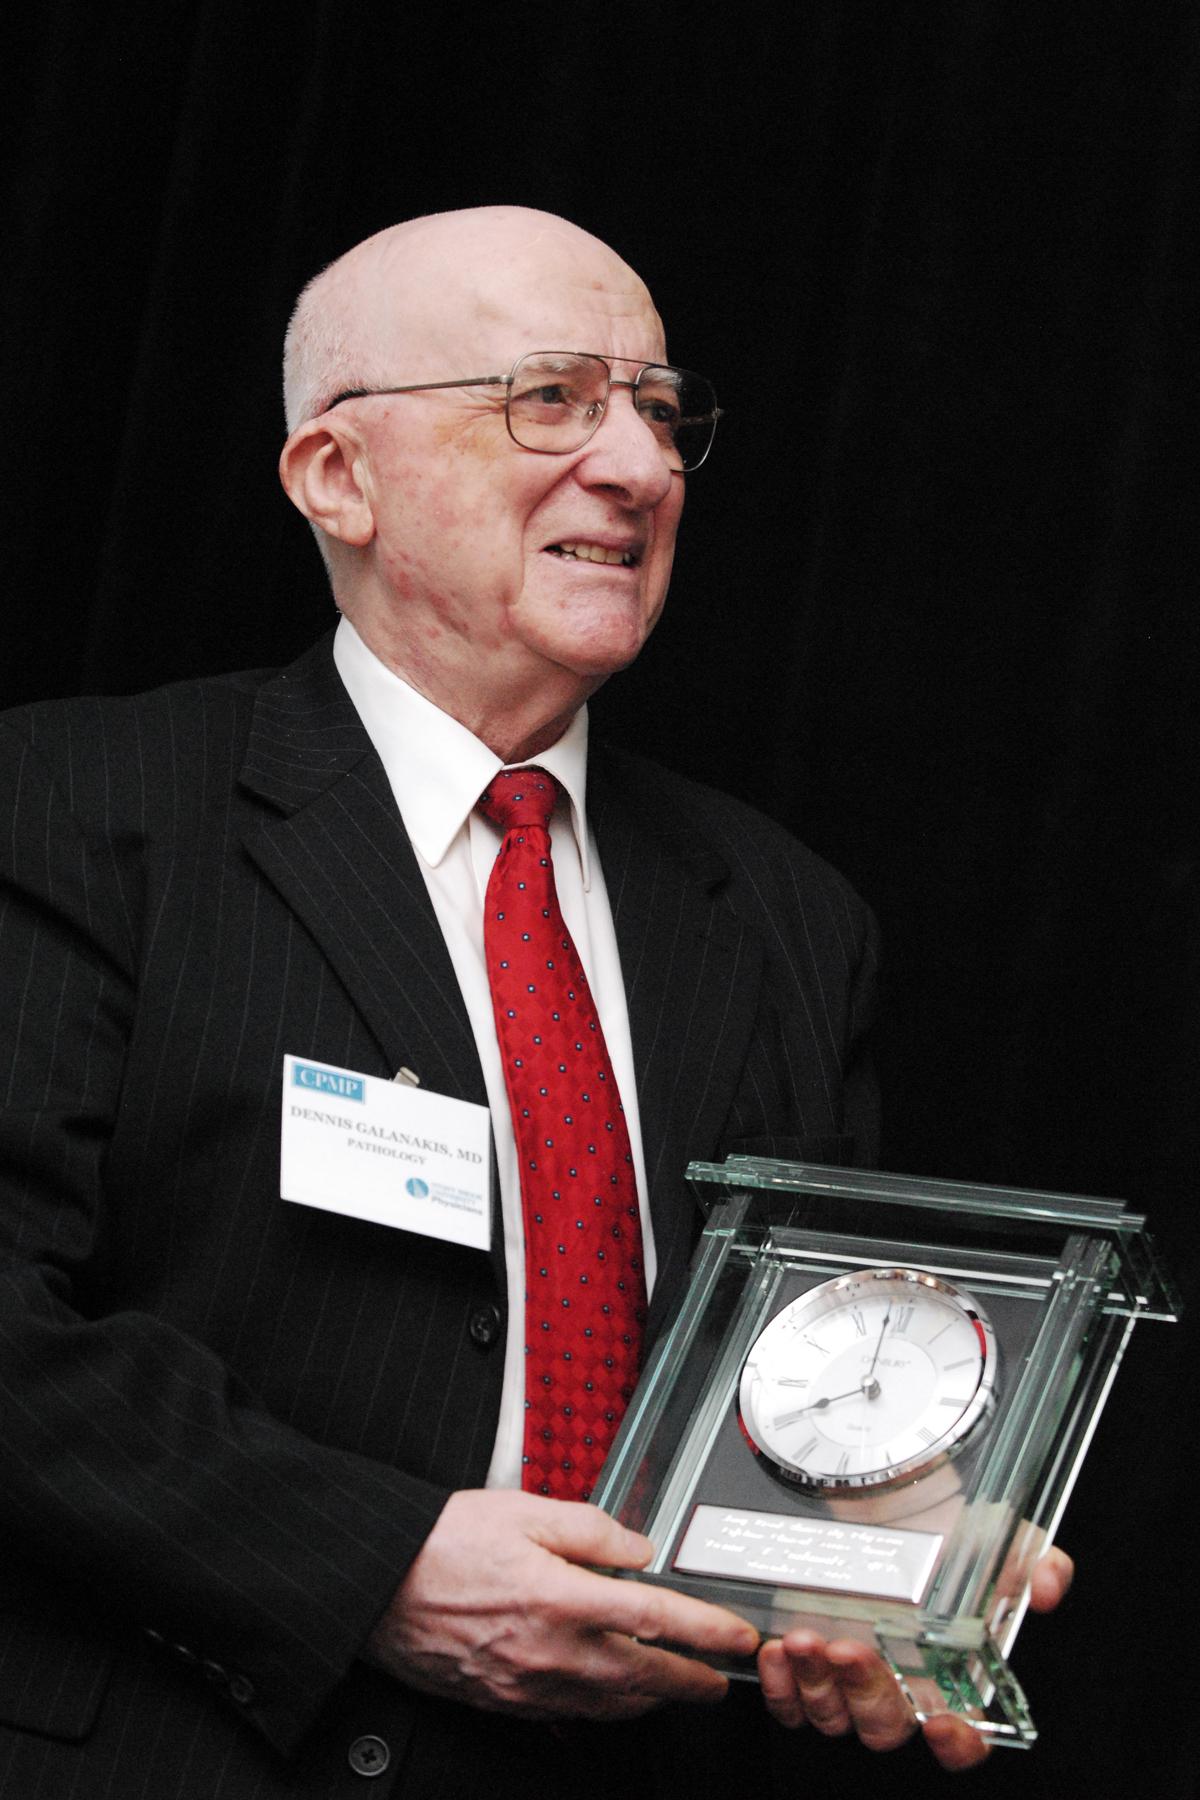 Galanakis award 09 1